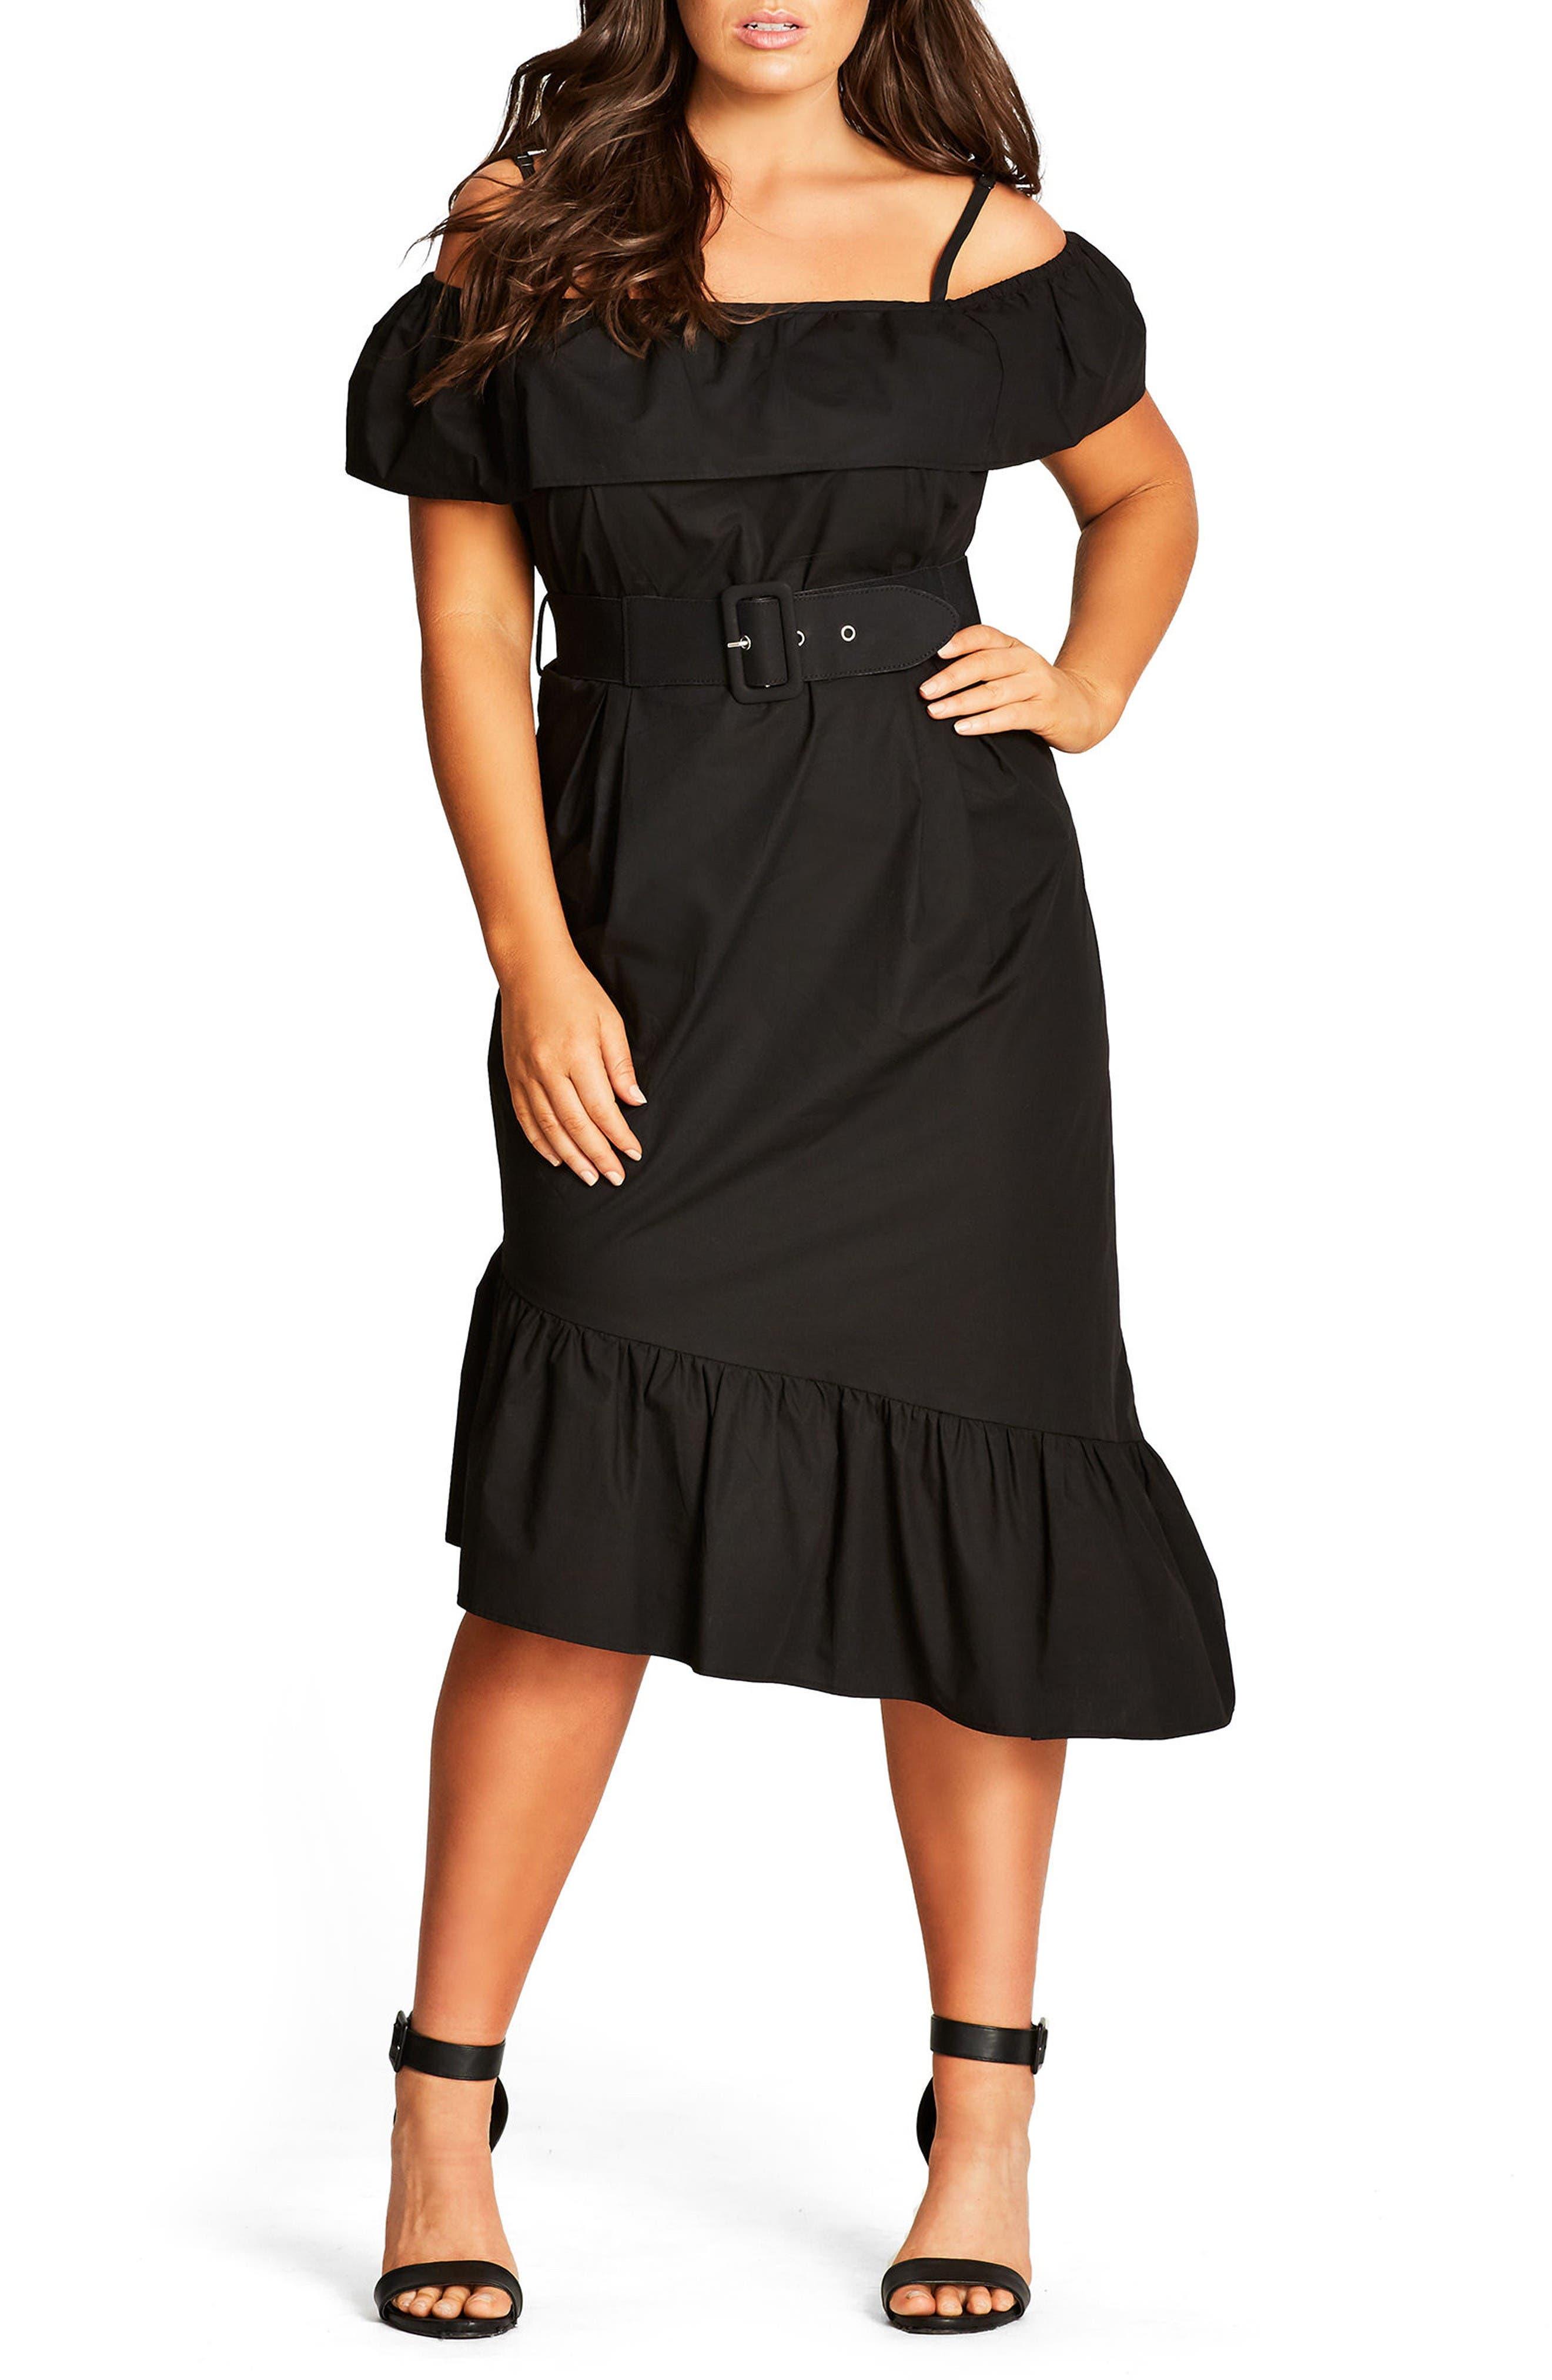 City Chic Saloon Baby Cold Shoulder Dress (Plus Size)